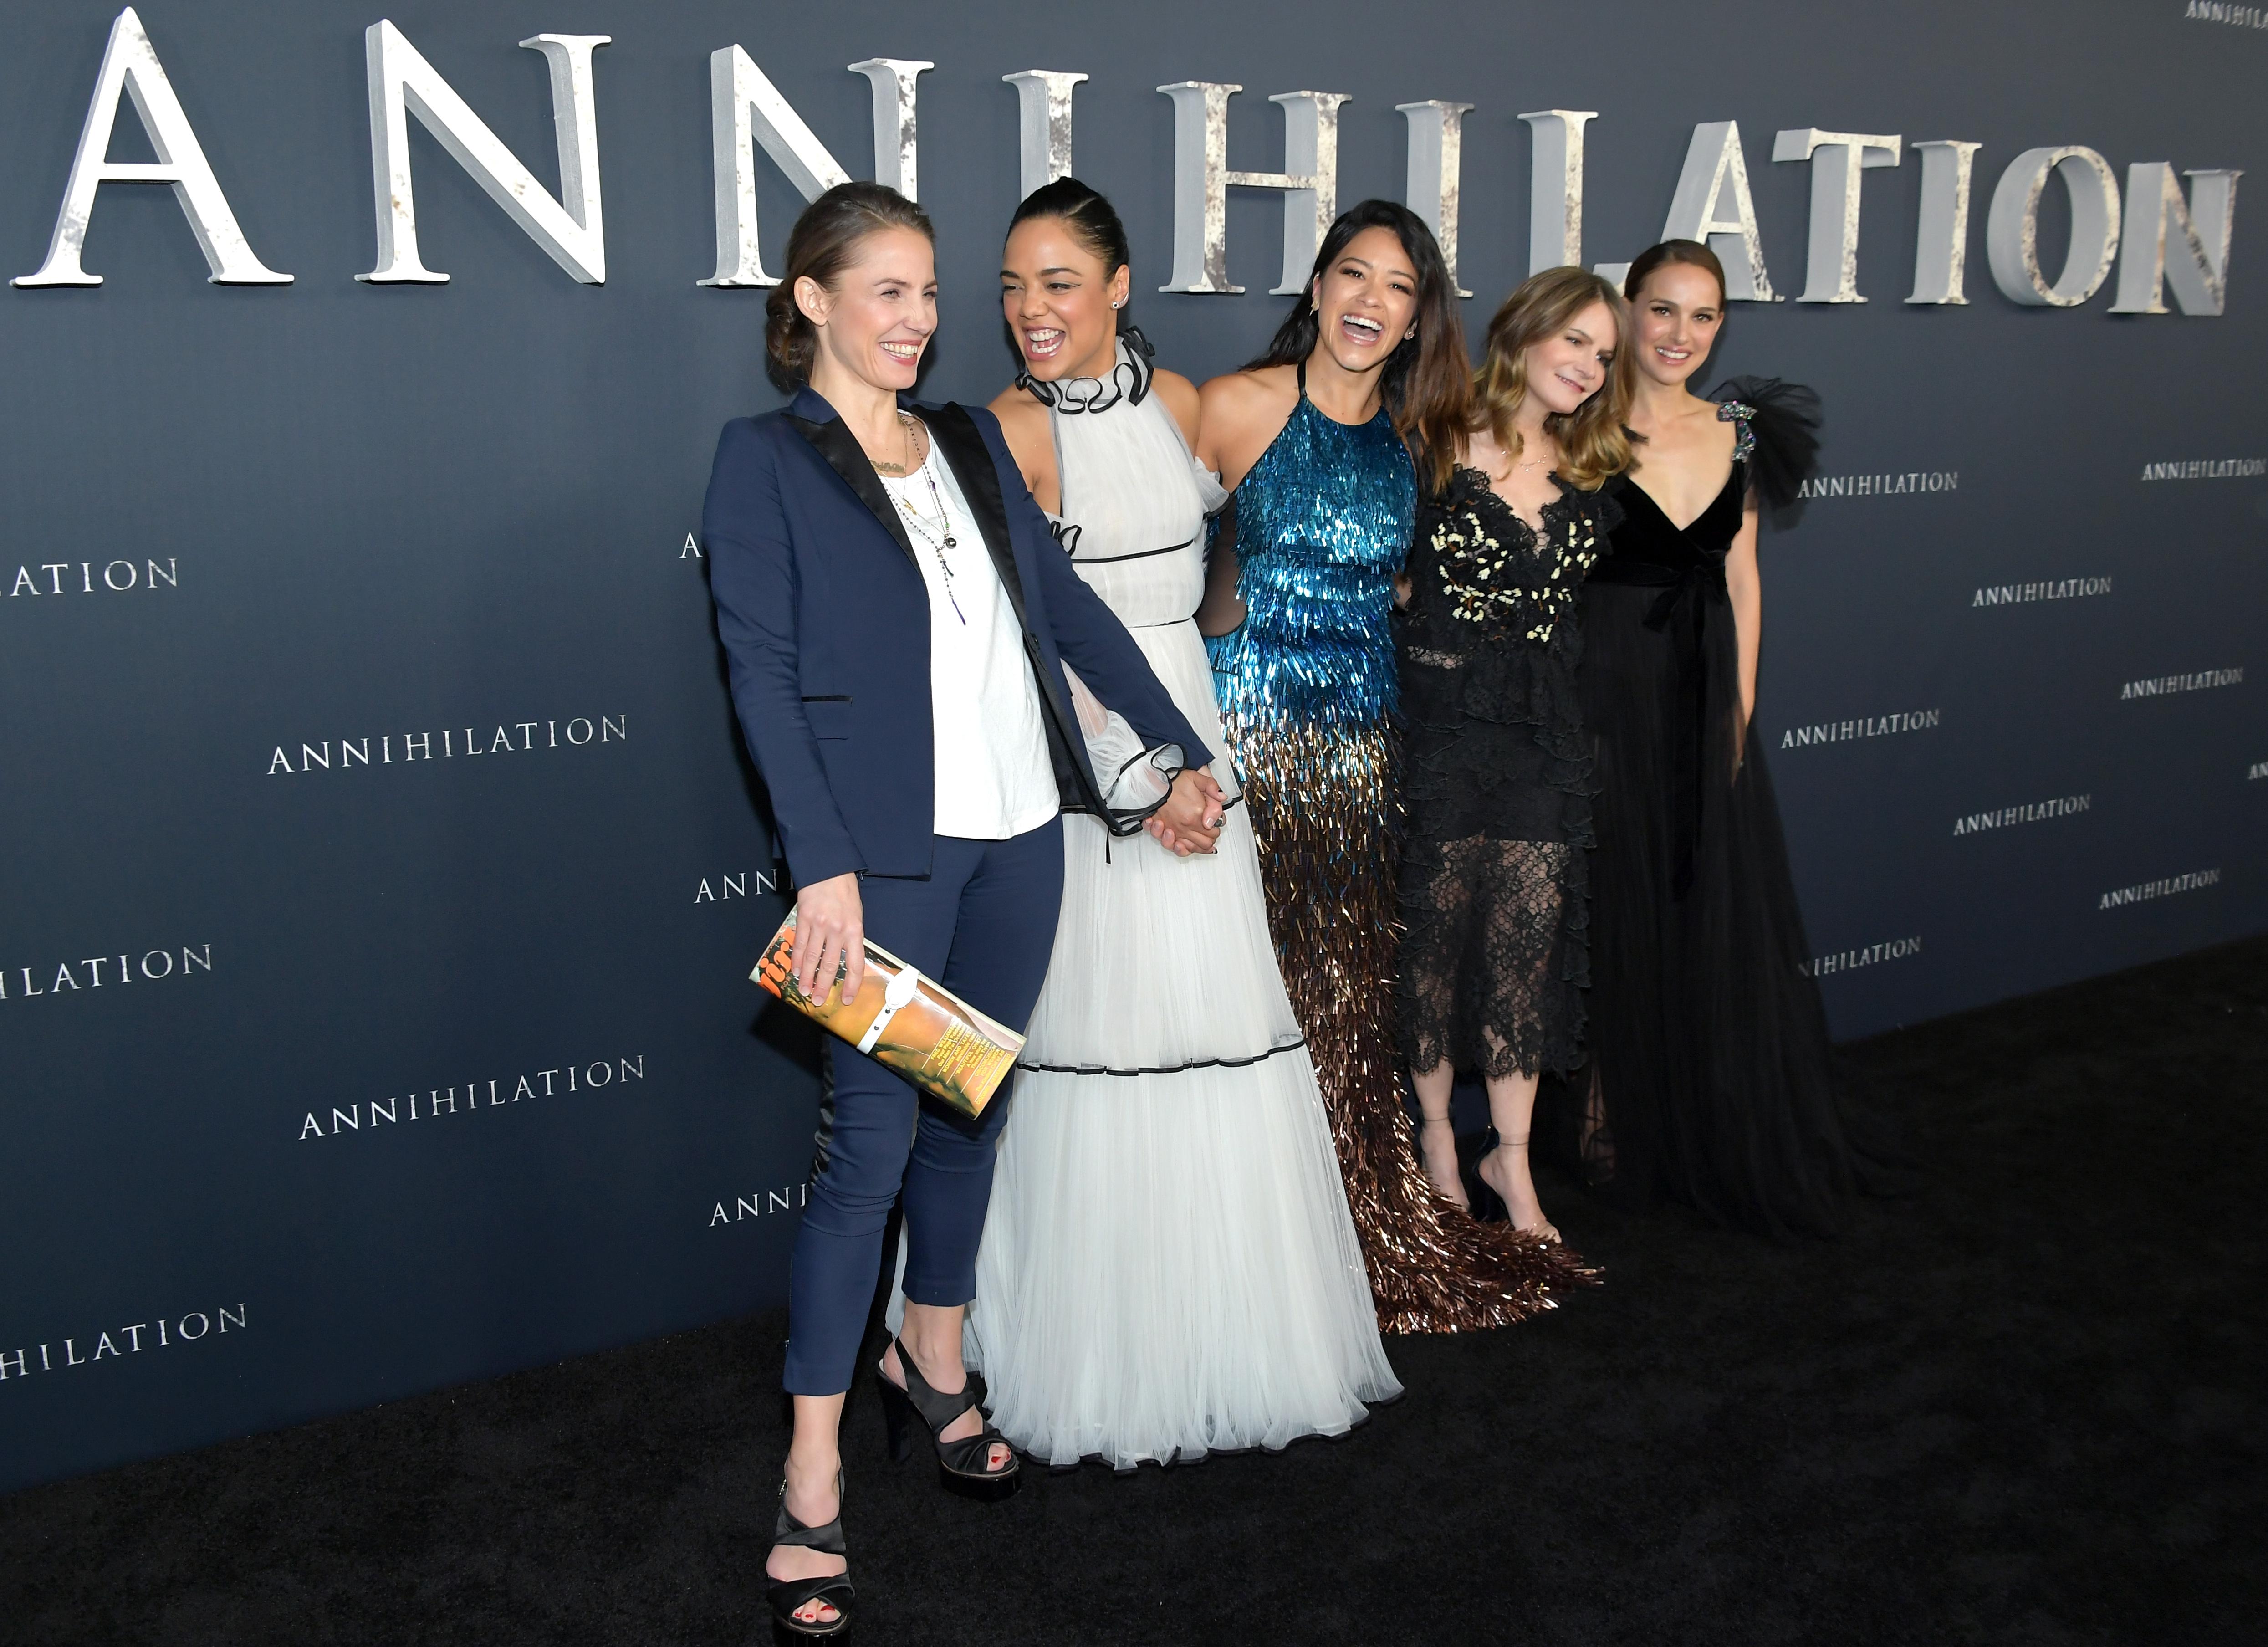 Tuva Novotny, Tessa Thompson, Gina Rodriguez, Jennifer Jason Leigh y Natalie Portman